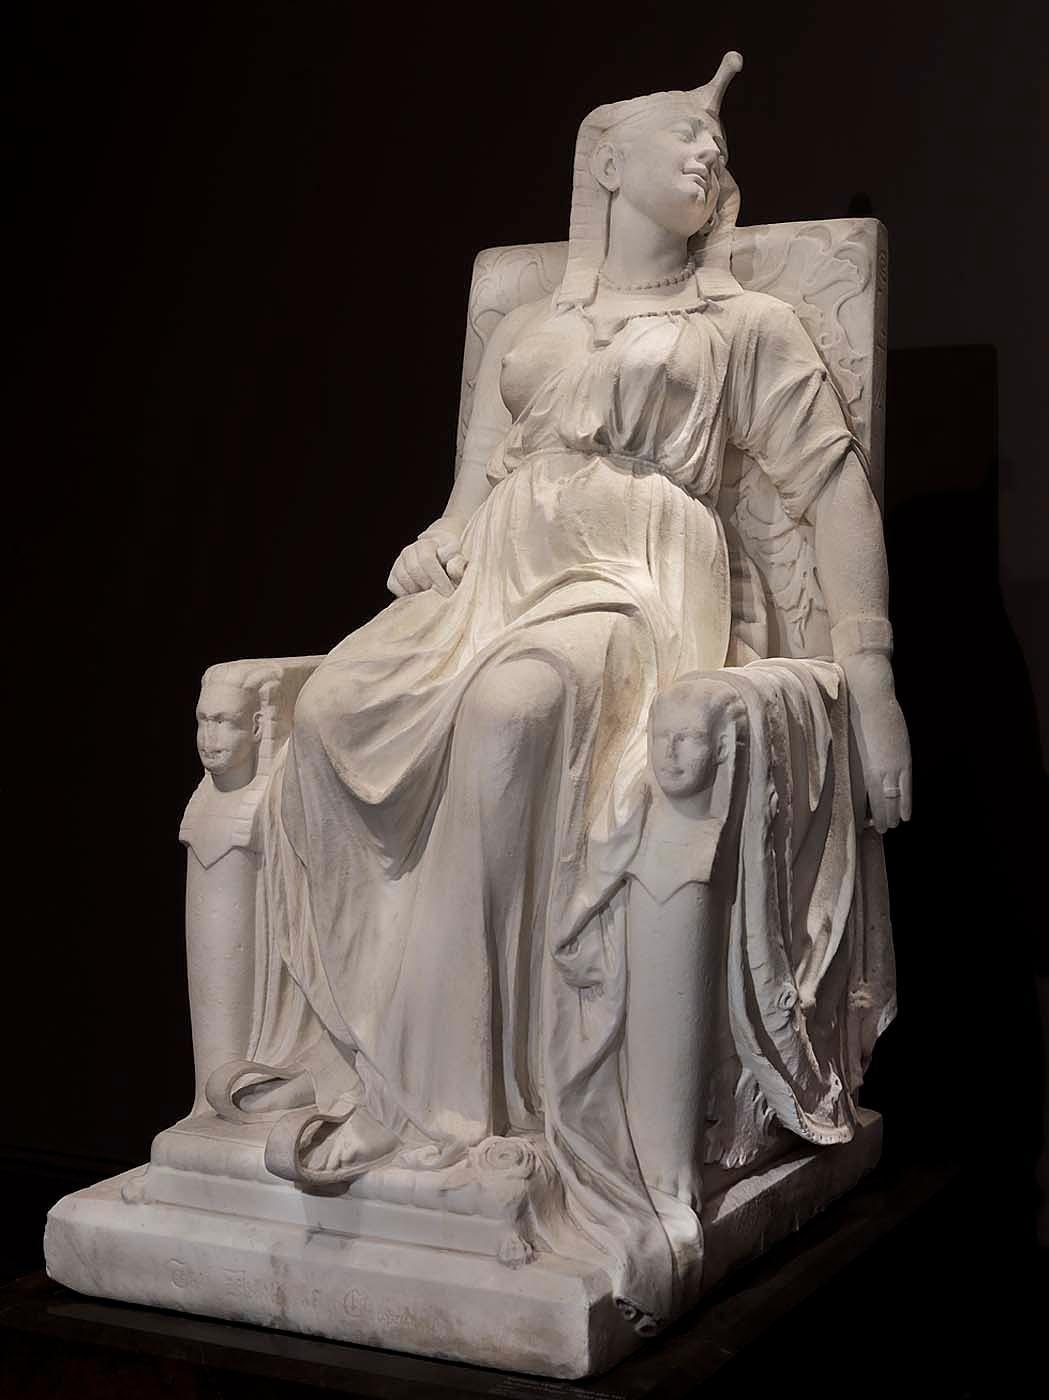 Google Doodle Sculpts a Tribute to Pioneering Artist Edmonia Lewis